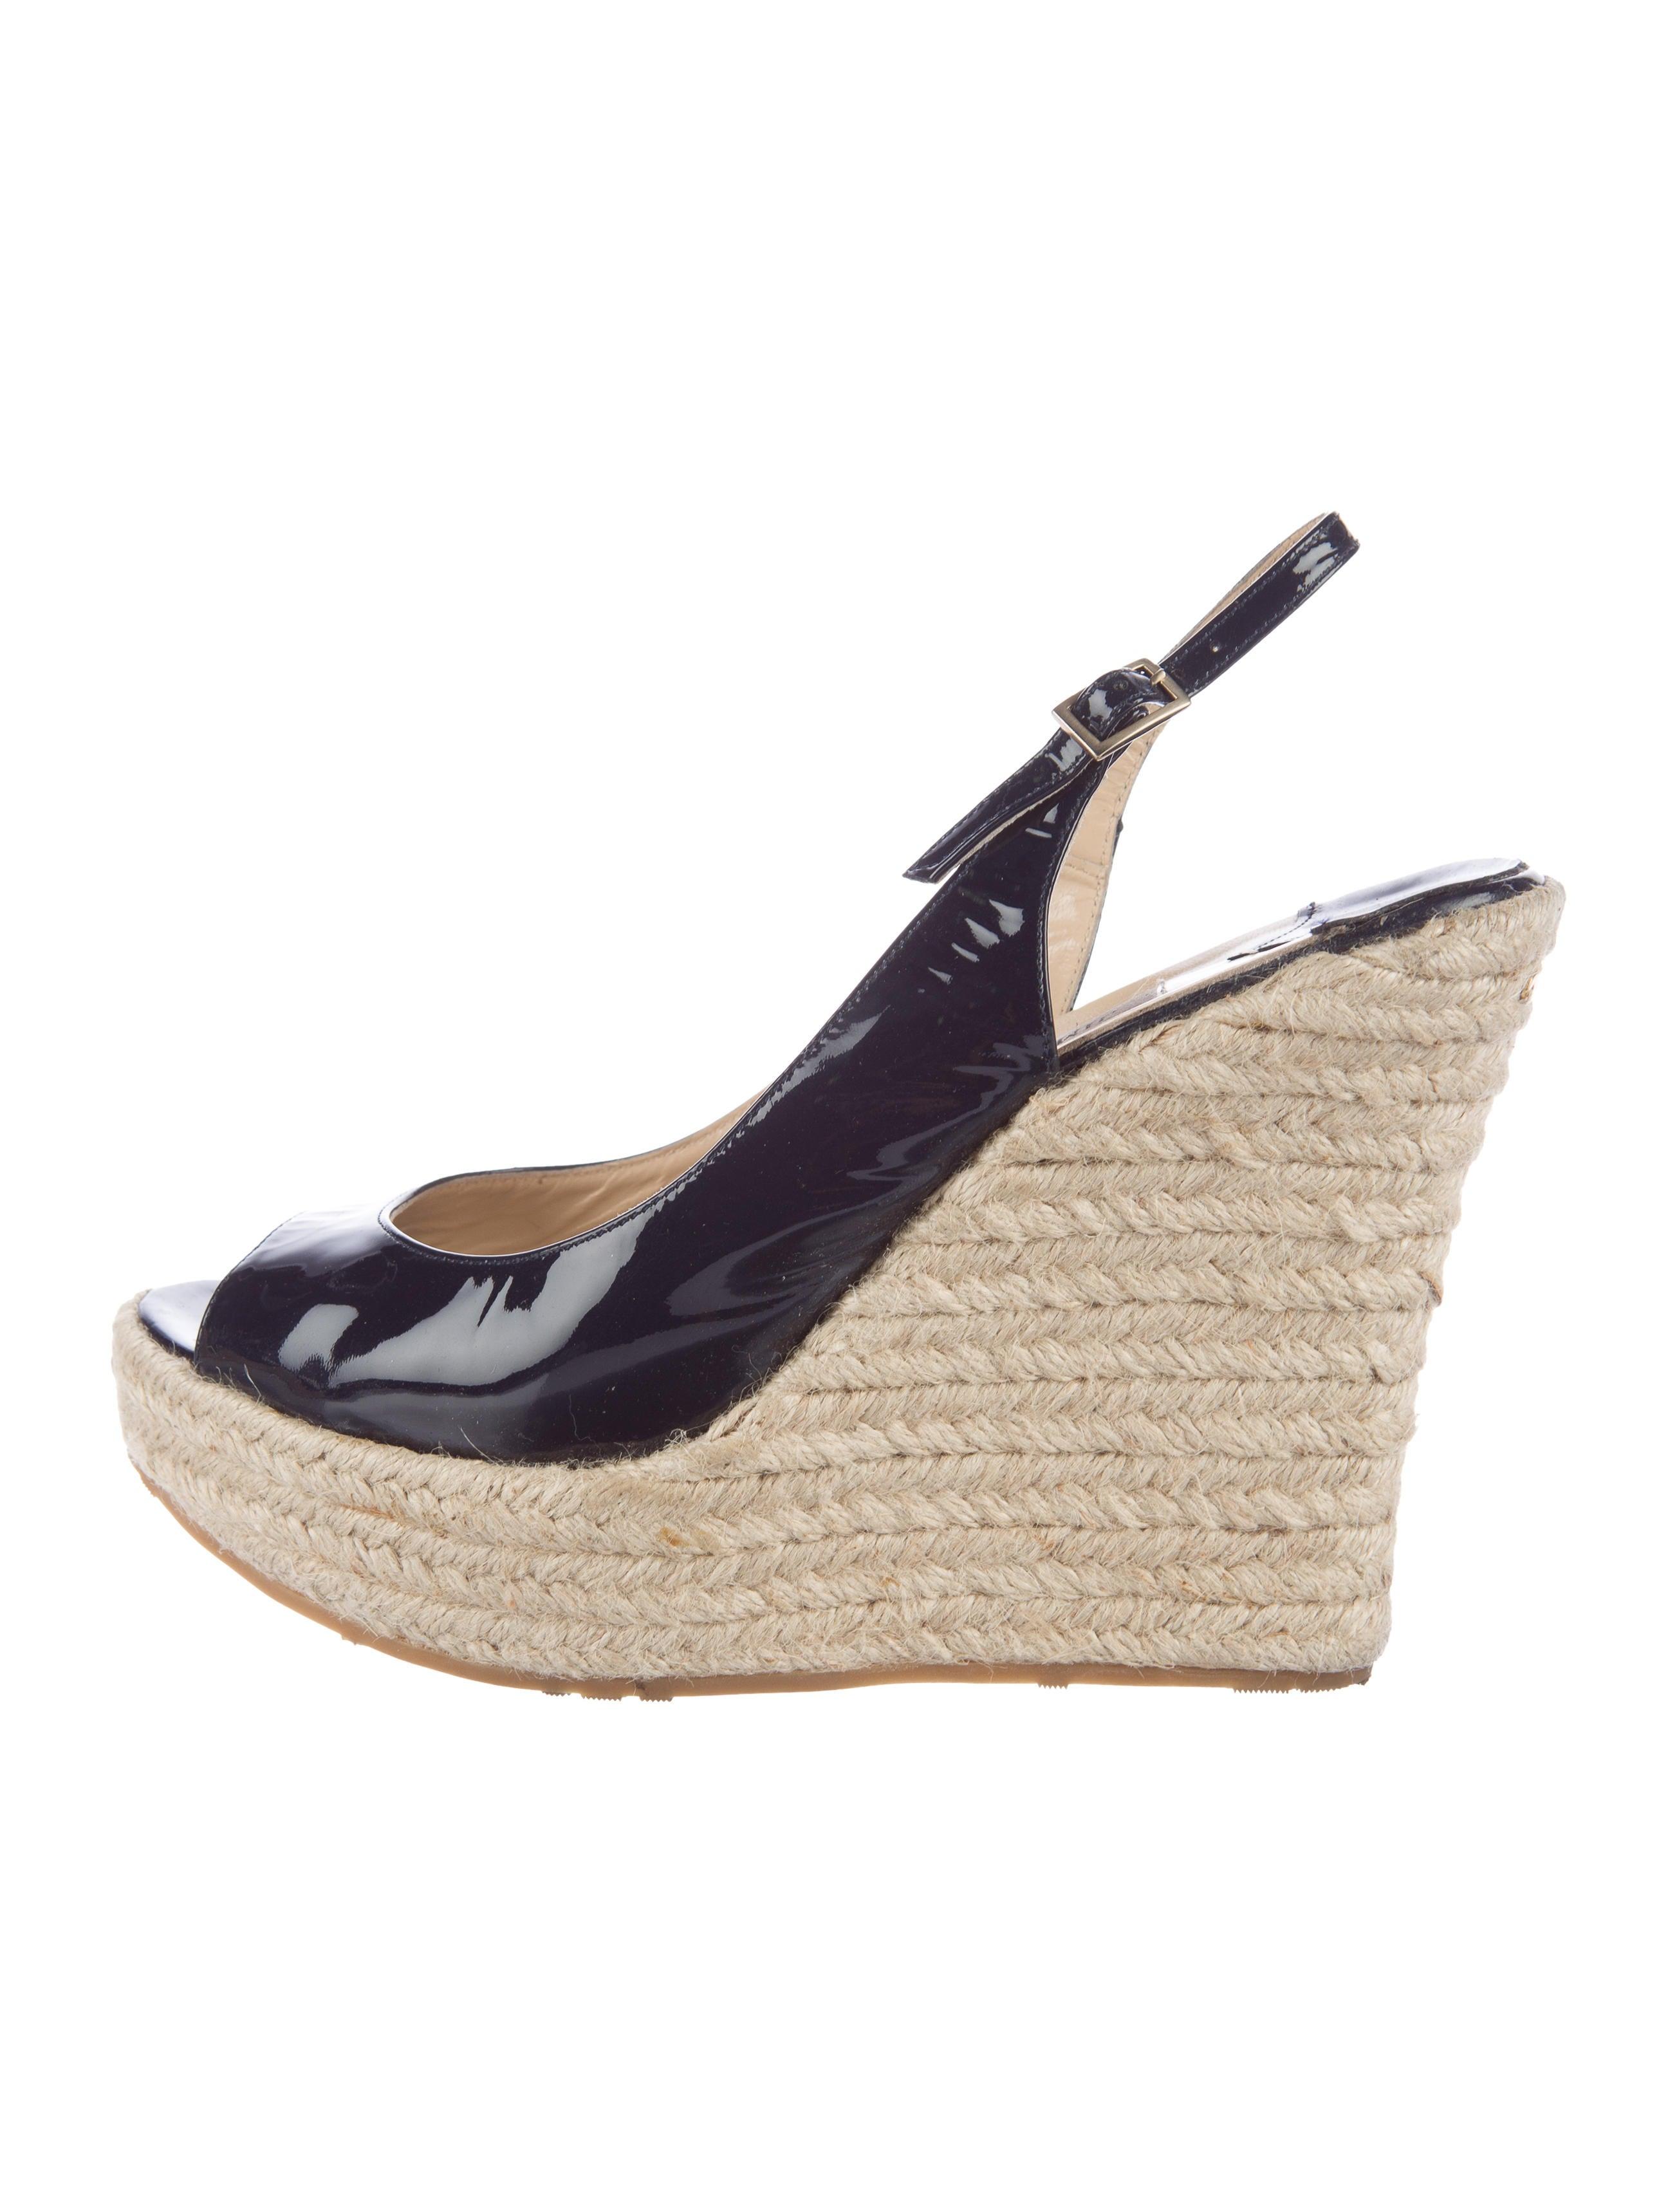 jimmy choo espadrille slingback wedges shoes jim61315